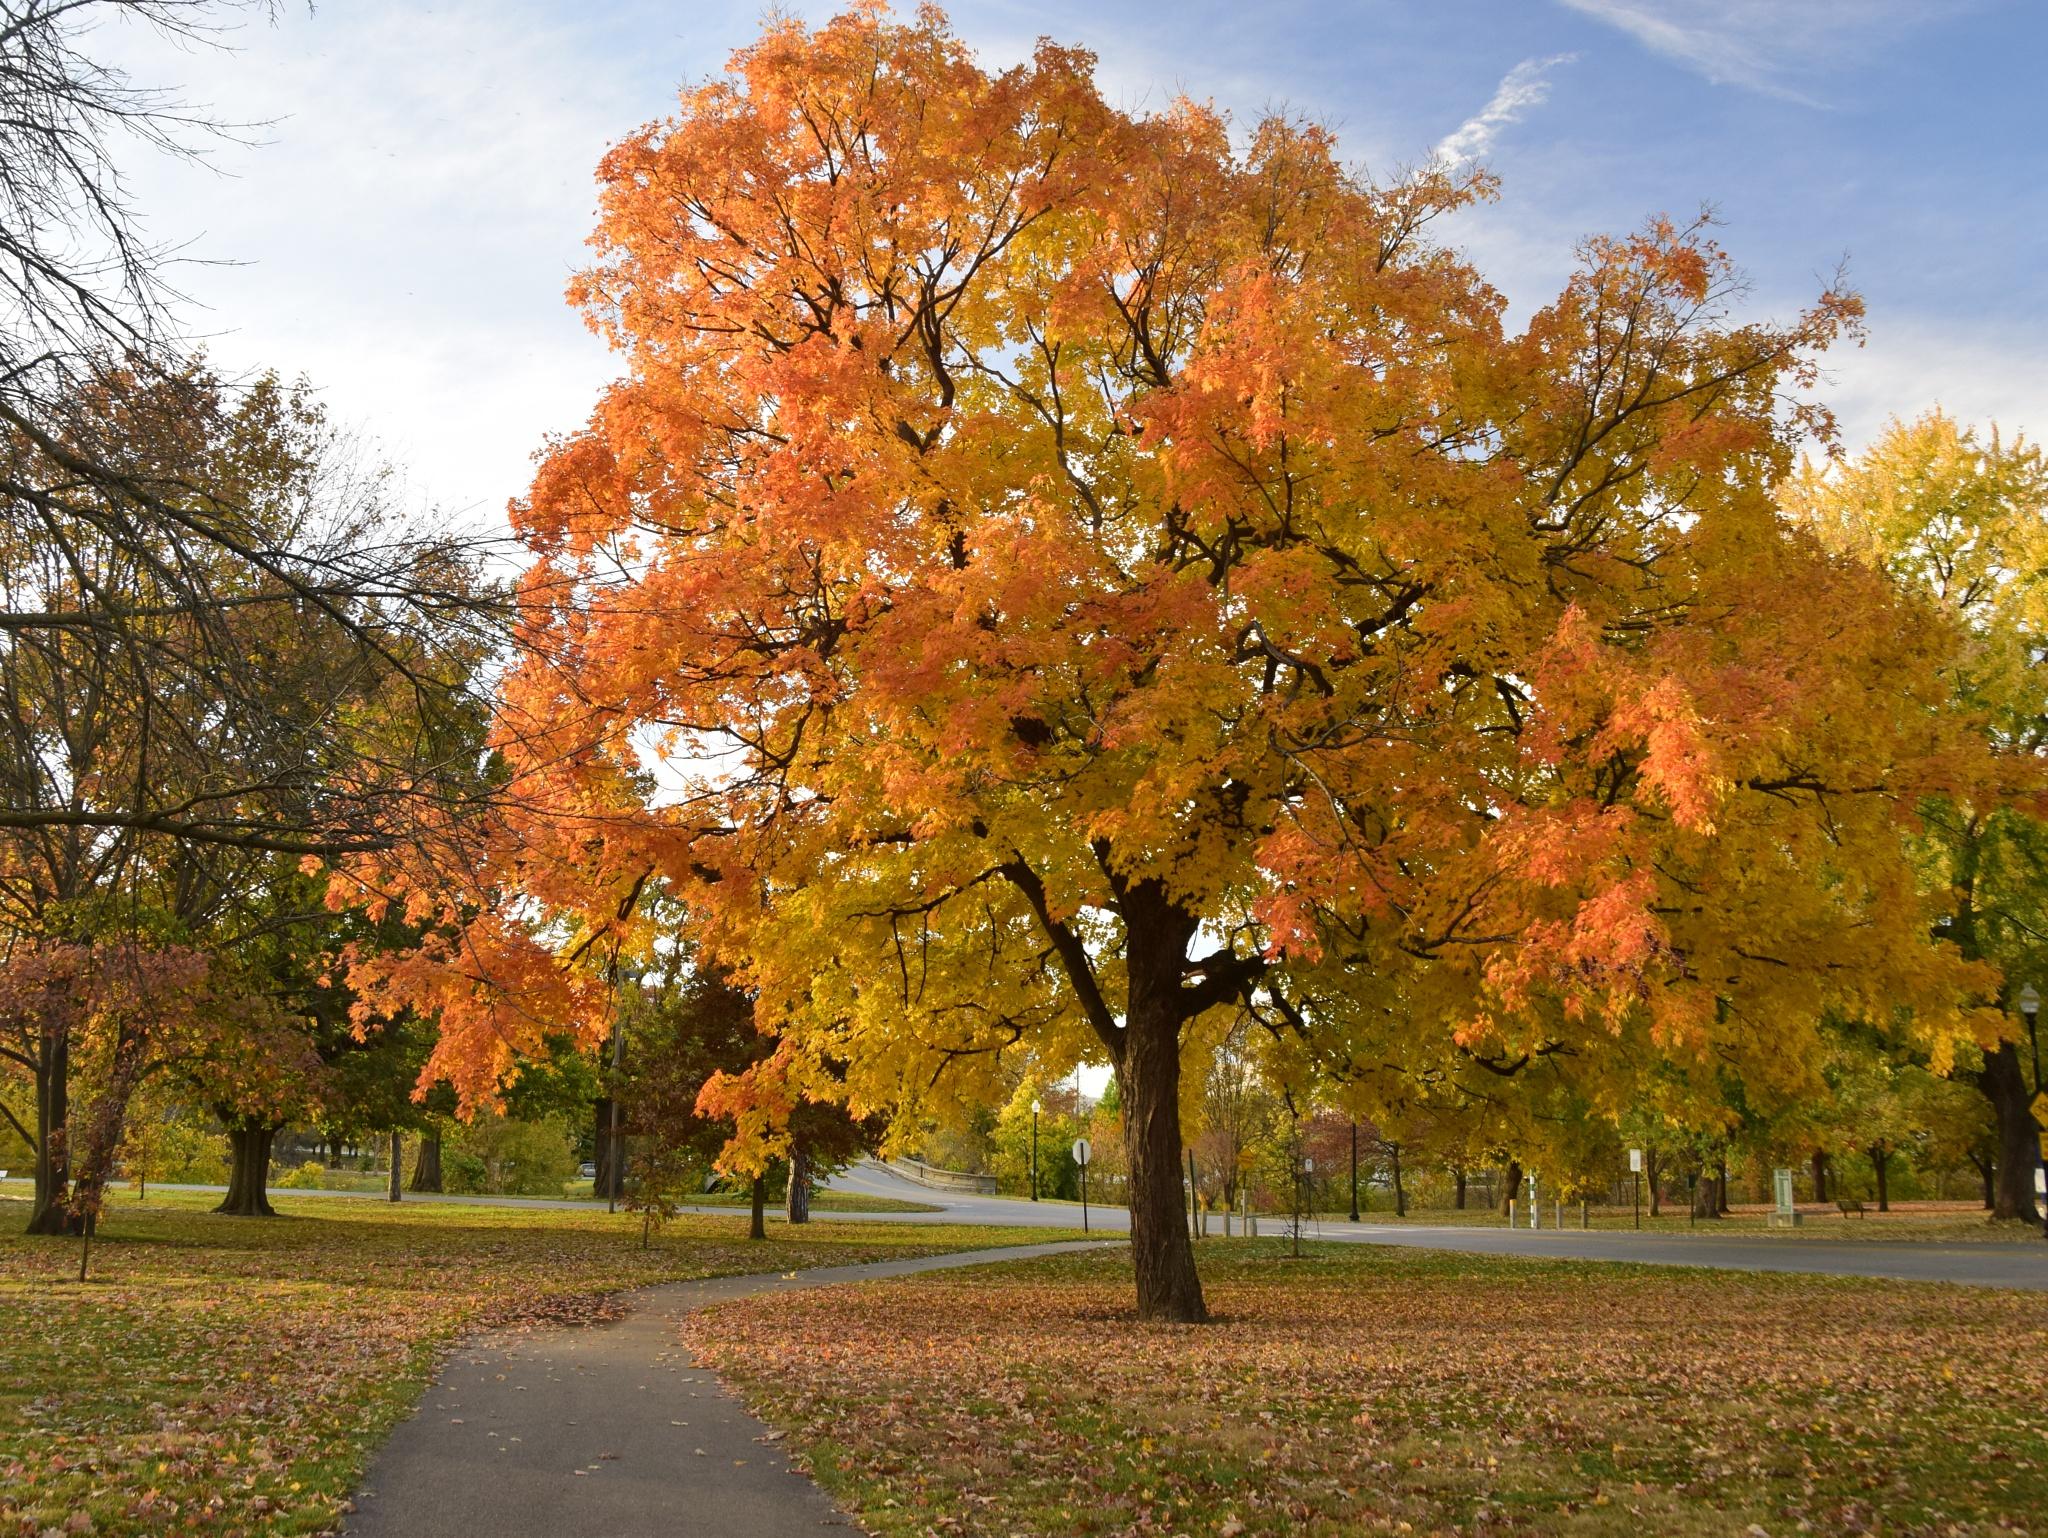 Autumn in Garfield Park by dan.tomkins